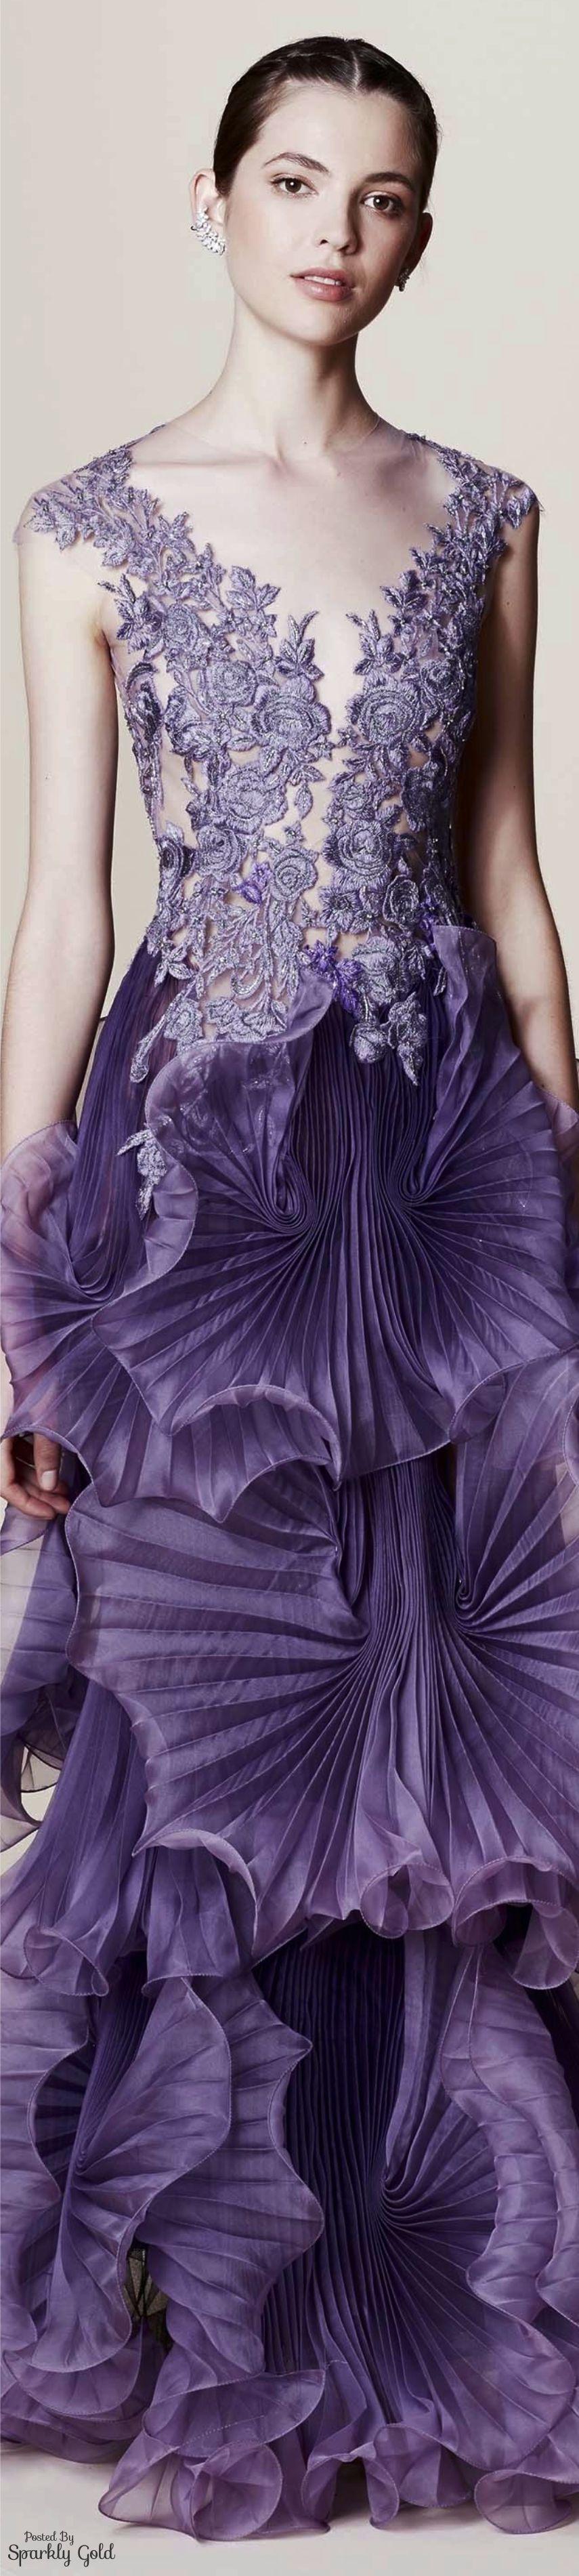 Marchesa Resort 2017 Lavender, purple, lace dress, wedding dresses ...